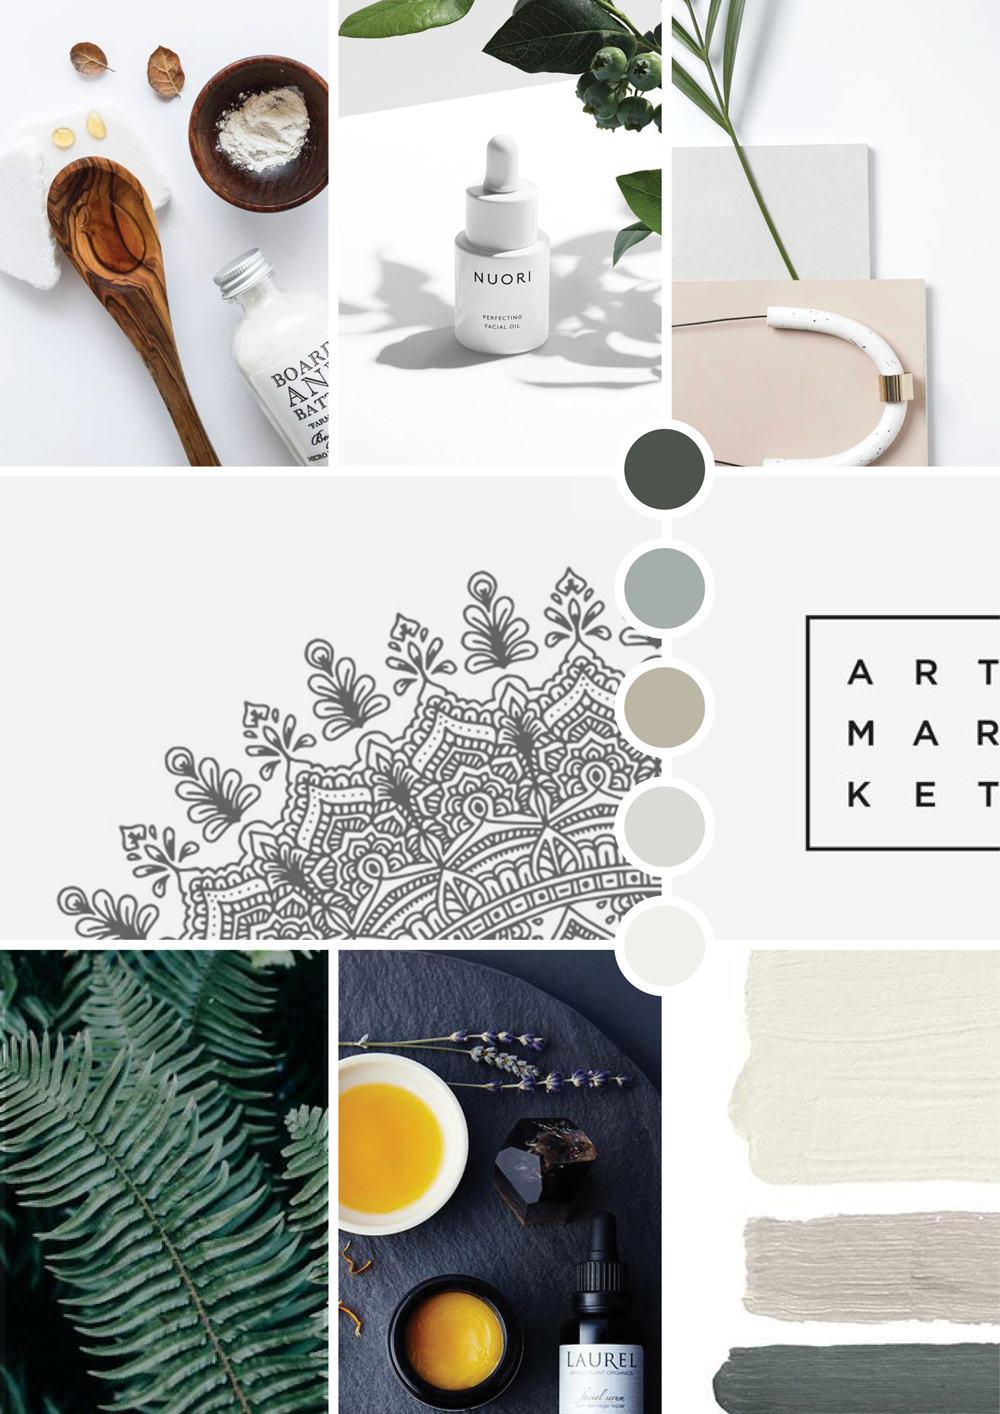 Kinlake-Ana-Herb-Branding-Design-Moodboard-B